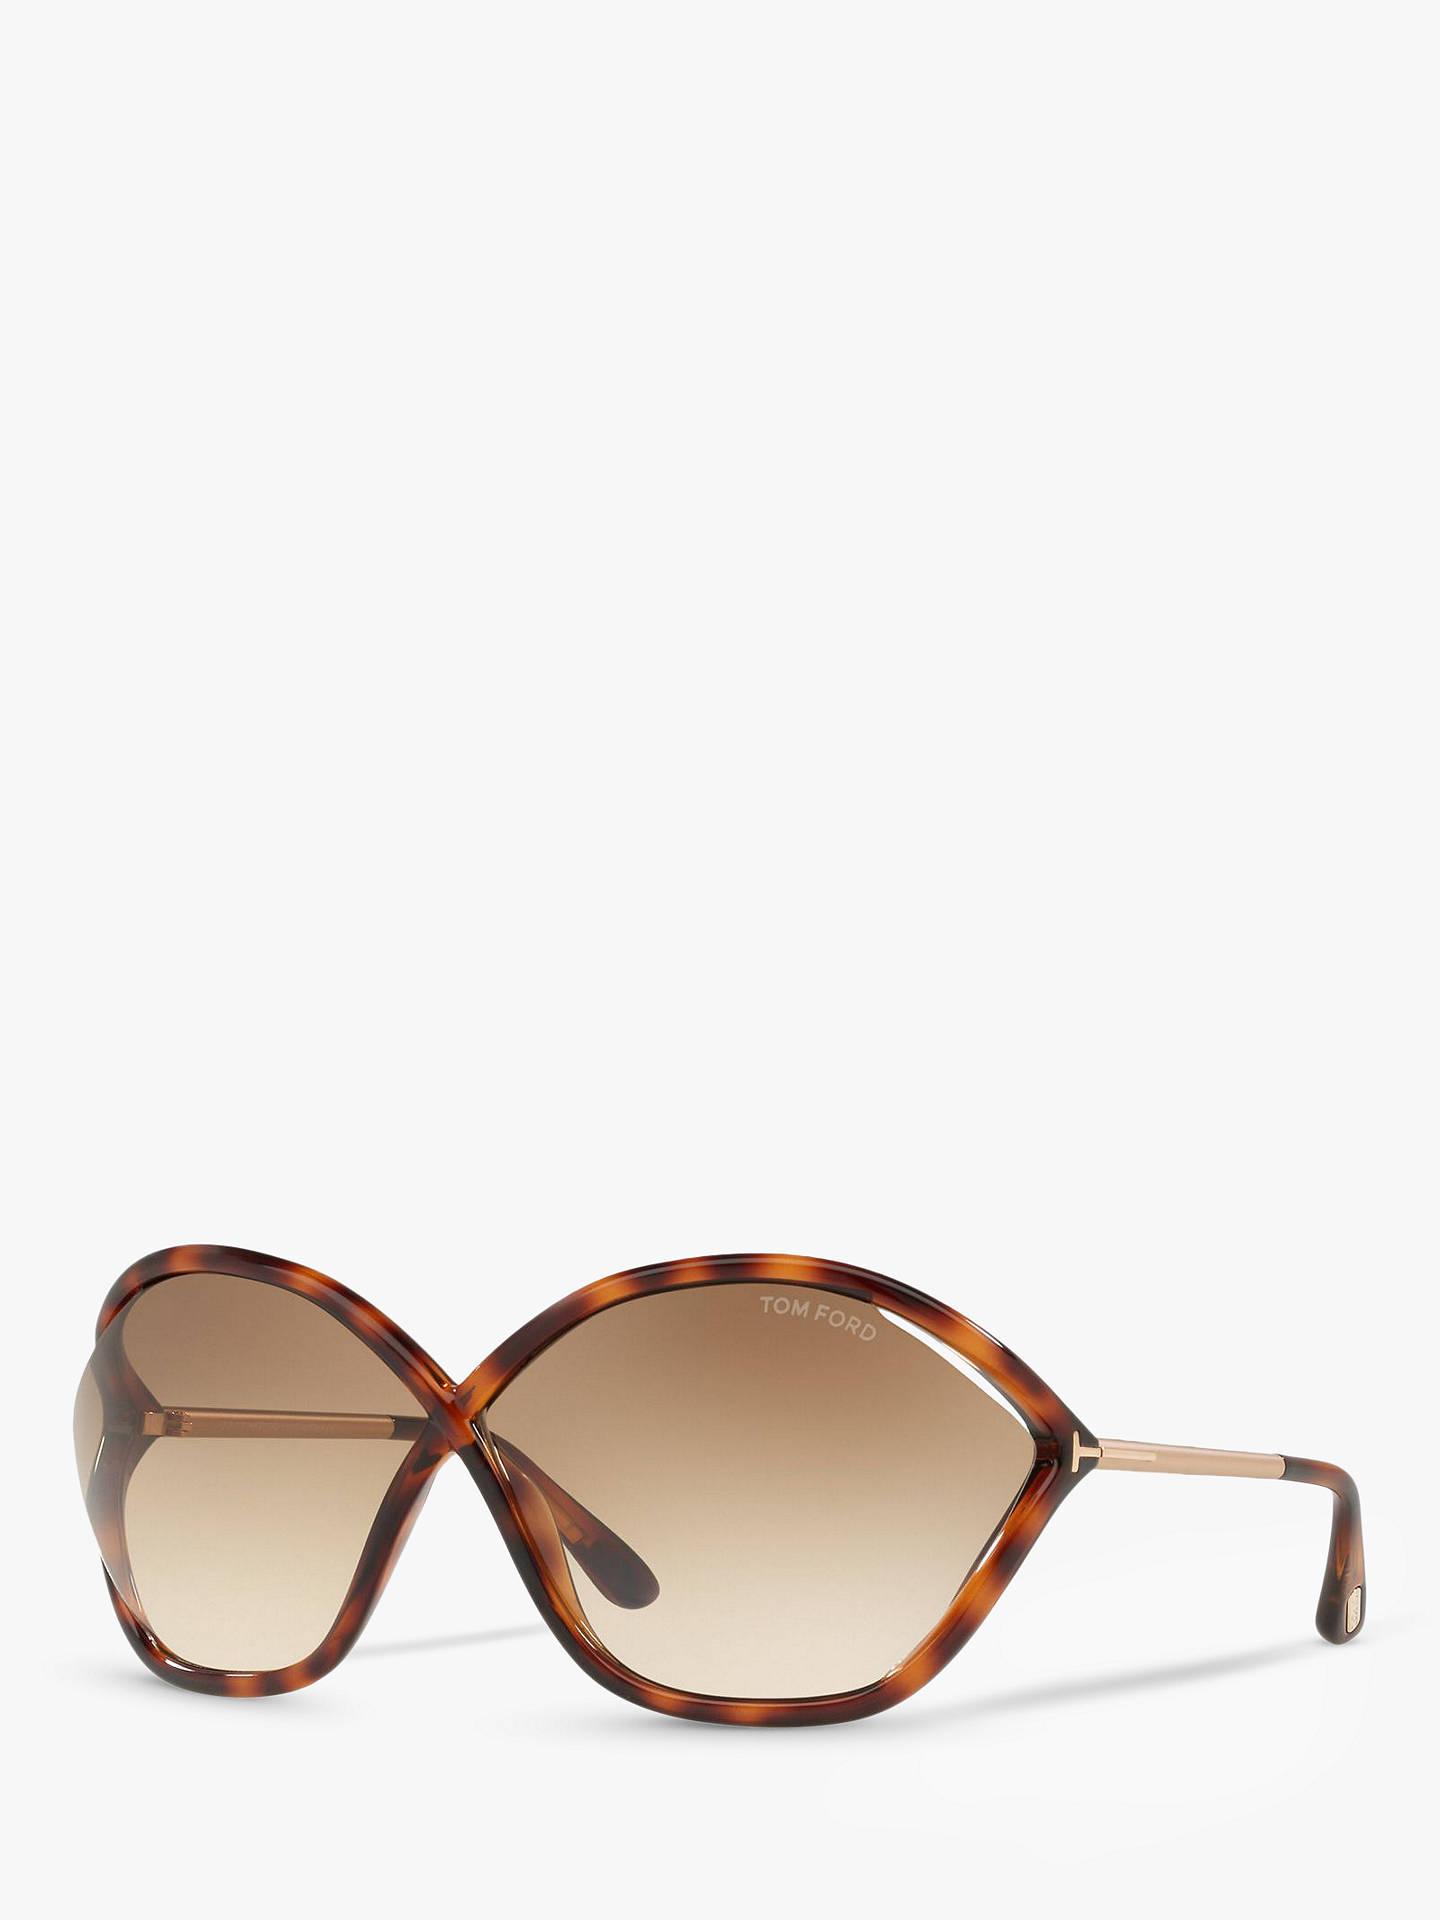 b4cef125979 TOM FORD FT0529 Bella Outsize Wrap Sunglasses at John Lewis   Partners